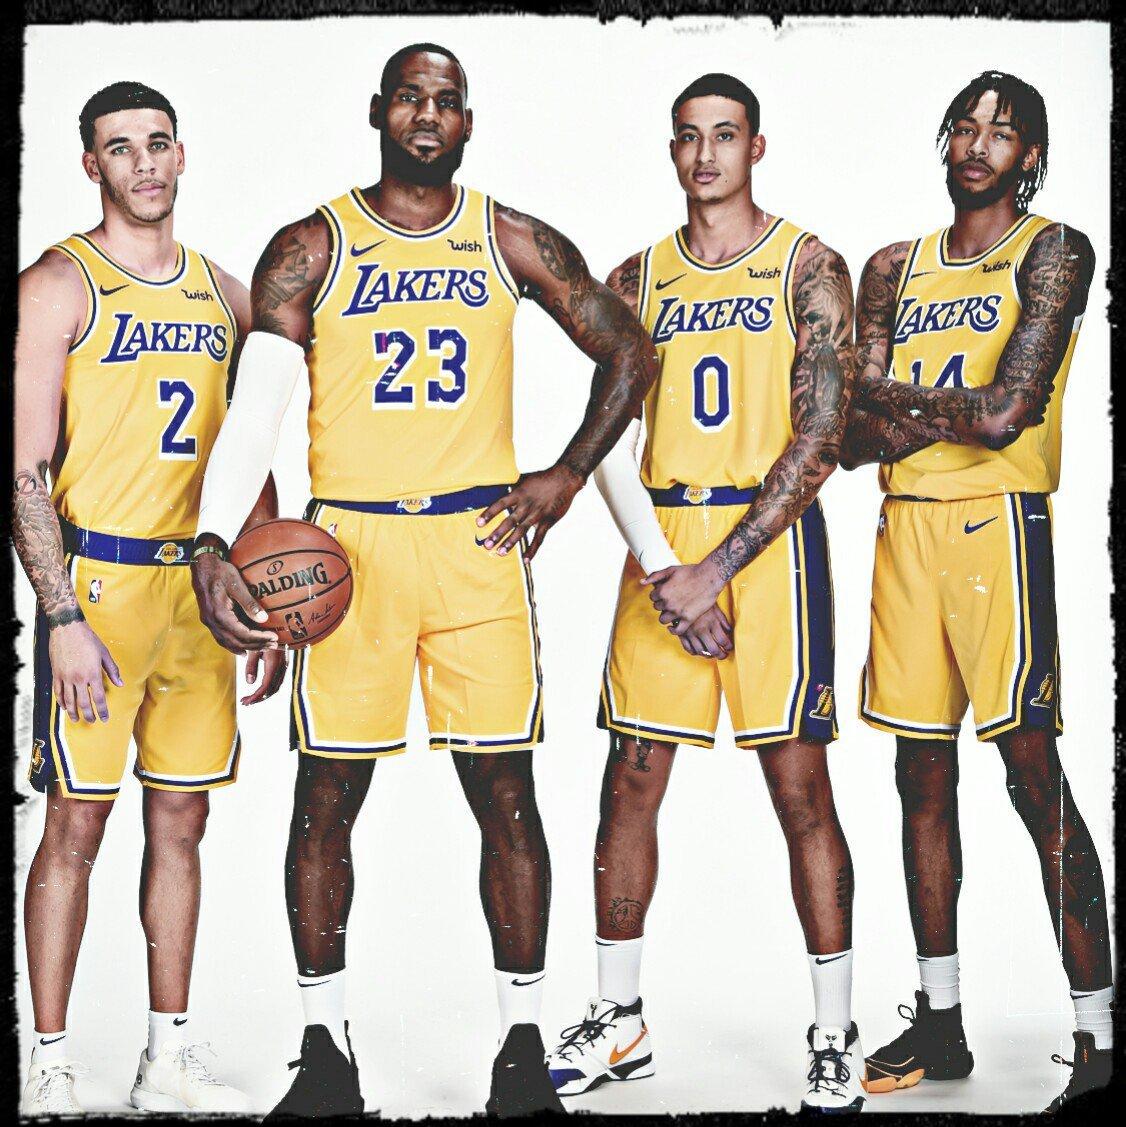 Los Angeles #Lakers 🏀 2018/19 season stat leaders  Points: #LeBronJames 27.4 Rebounds: LeBron James 8.5 Assists: LeBron James 8.3 Steals: #LonzoBall 1.5 Blocks: #JaValeMcGee 2 Assisttoturnover ratio: #RajonRondo 2.9